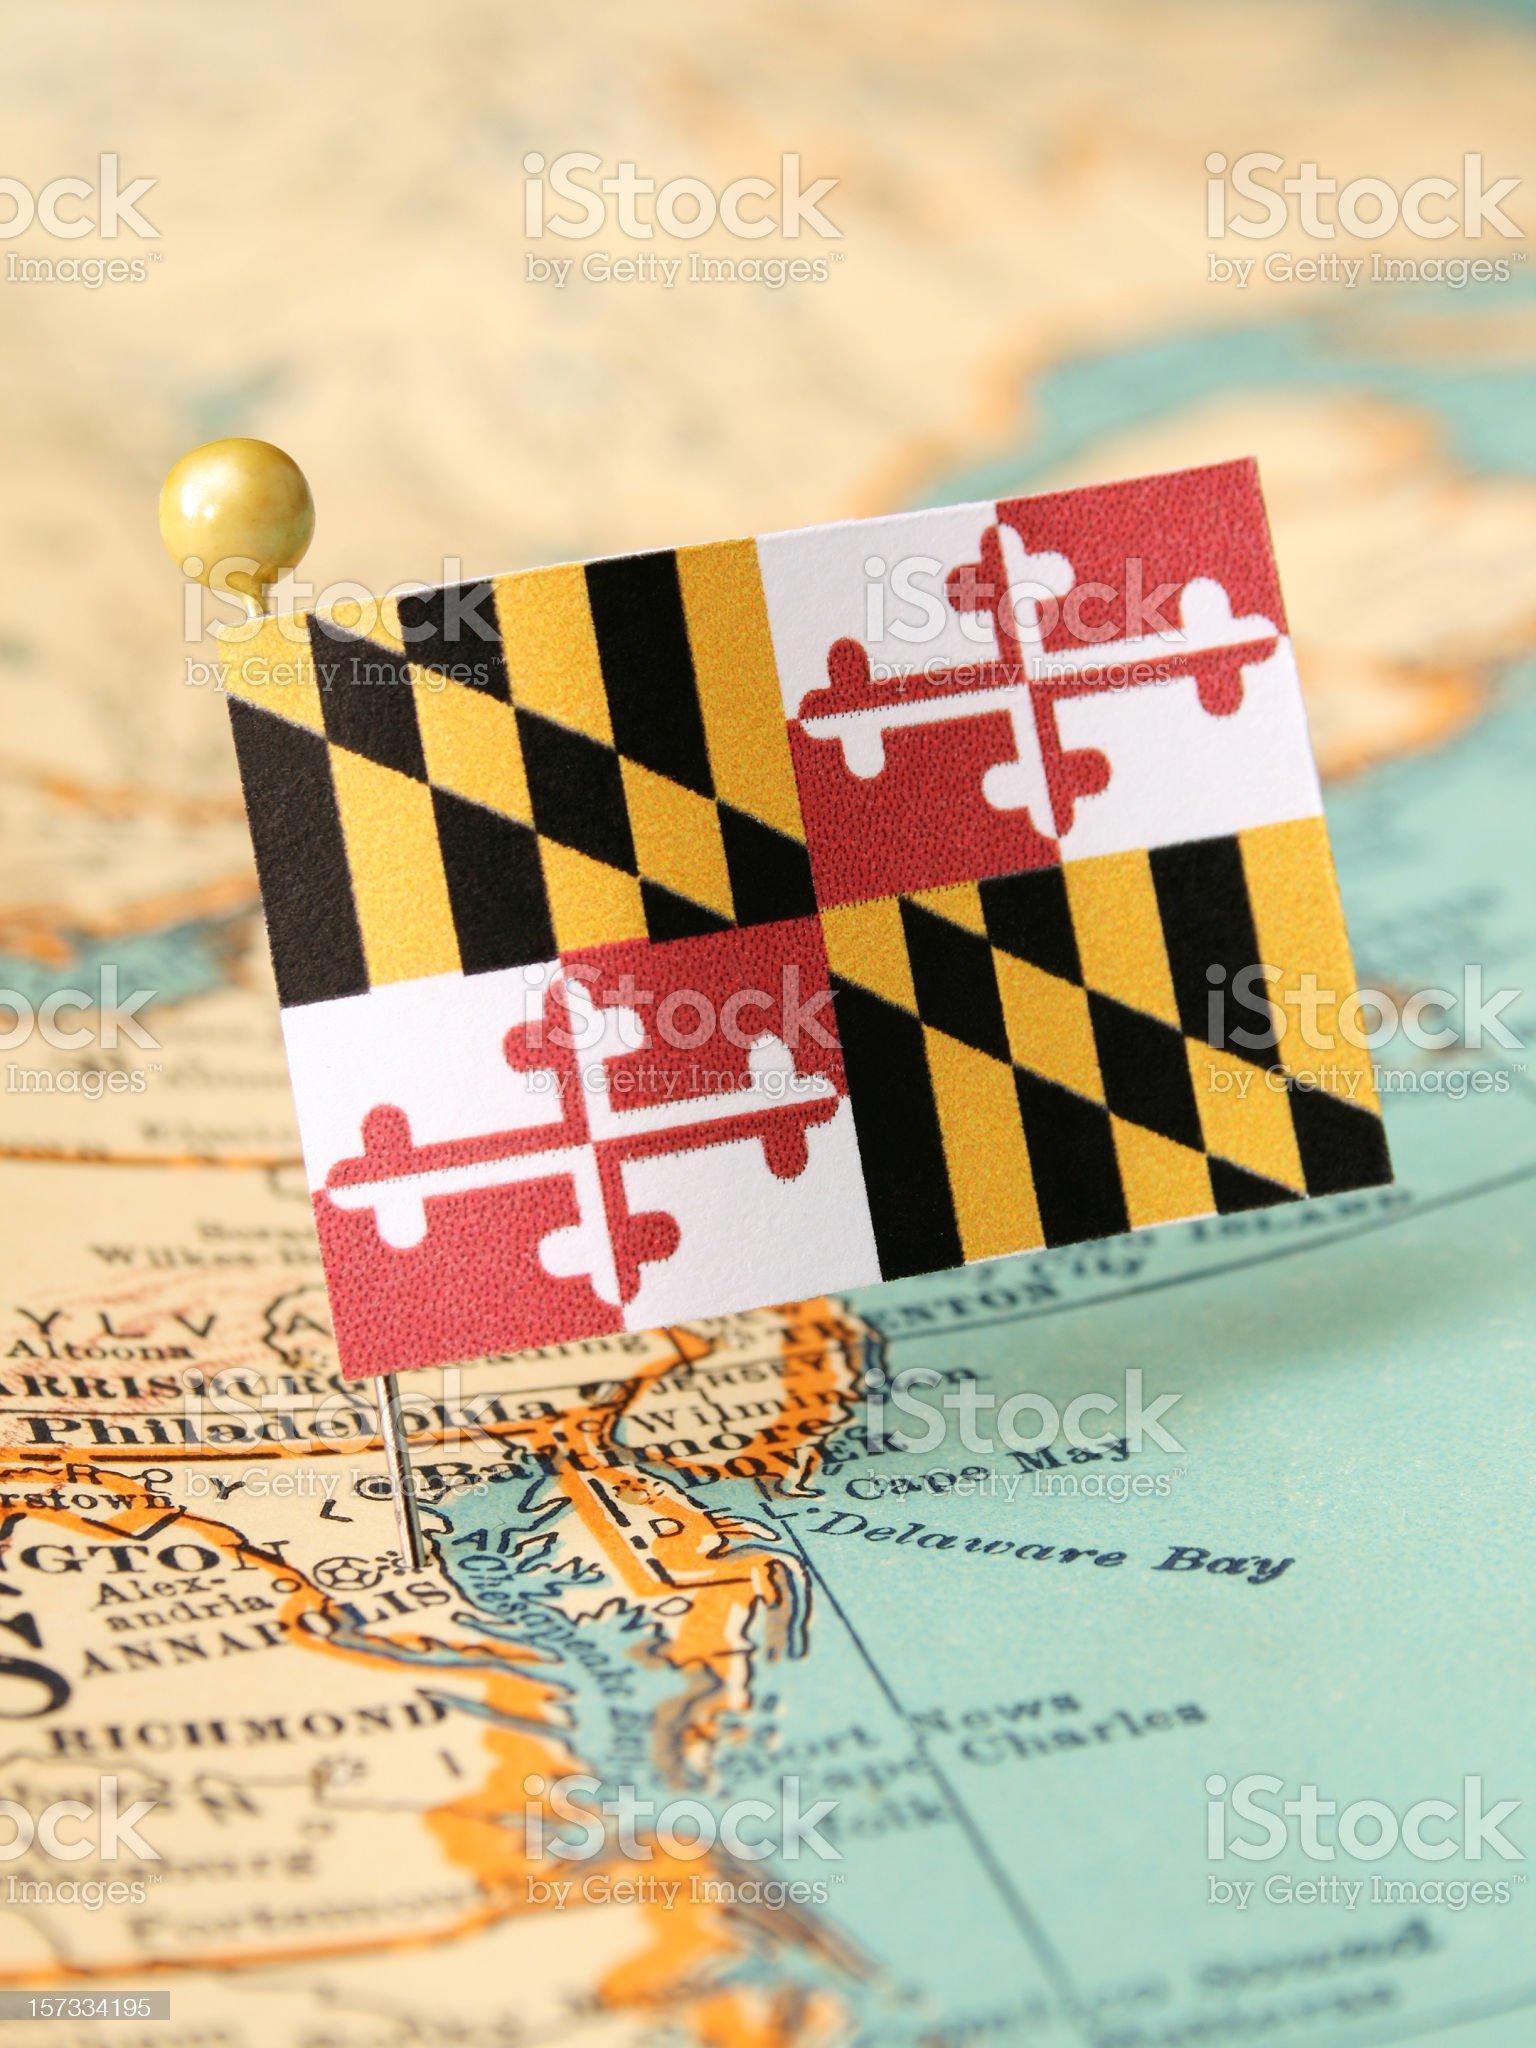 Maryland royalty-free stock photo